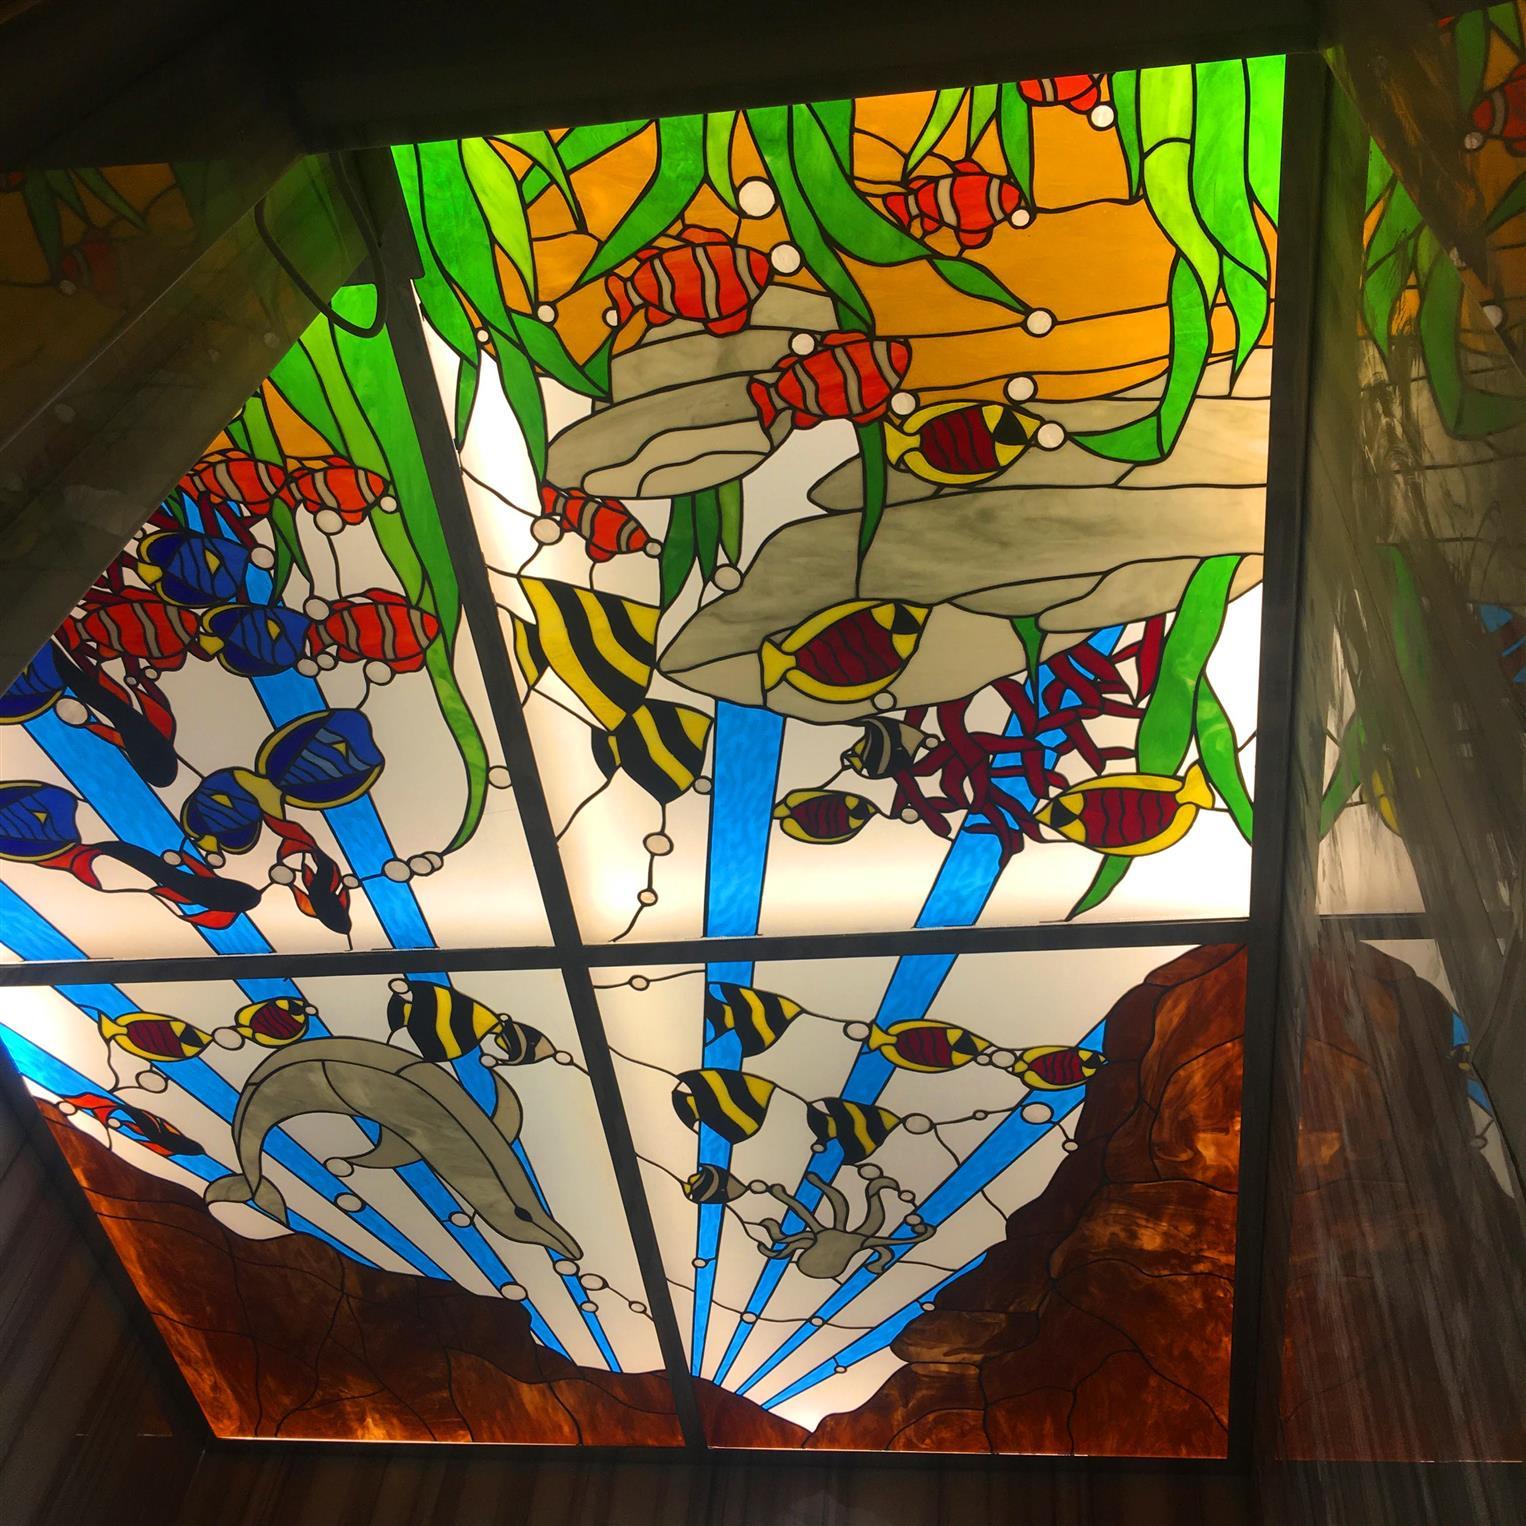 hamam-banyo-tavan-vitraylari20171221185321309.jpg izmir vitray çalışması